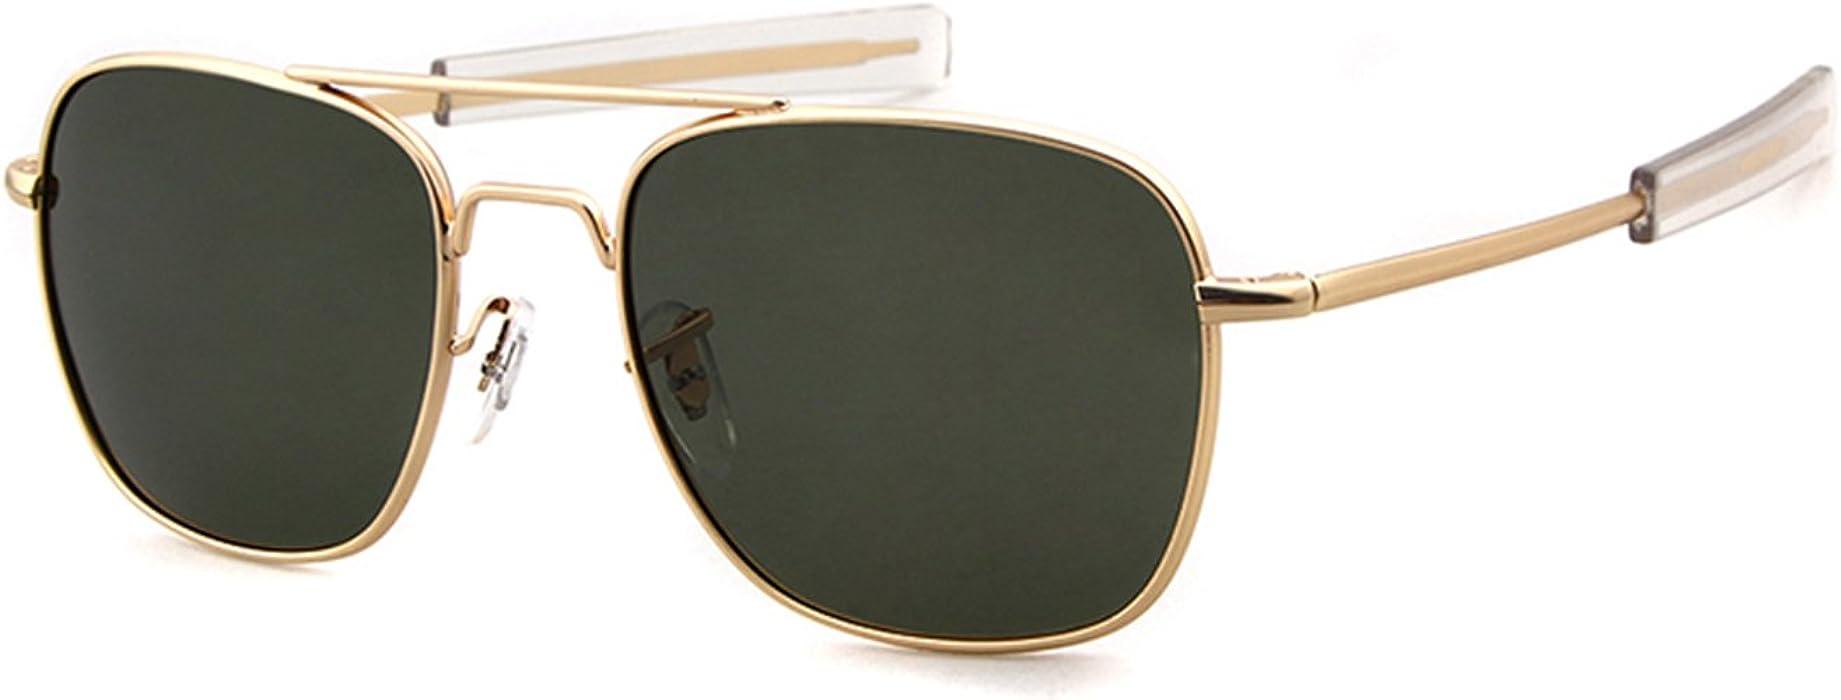 75be209bd Aviator Sunglasses Polarized For Men Women Square Mirror Metal Frame Sun  Glasses